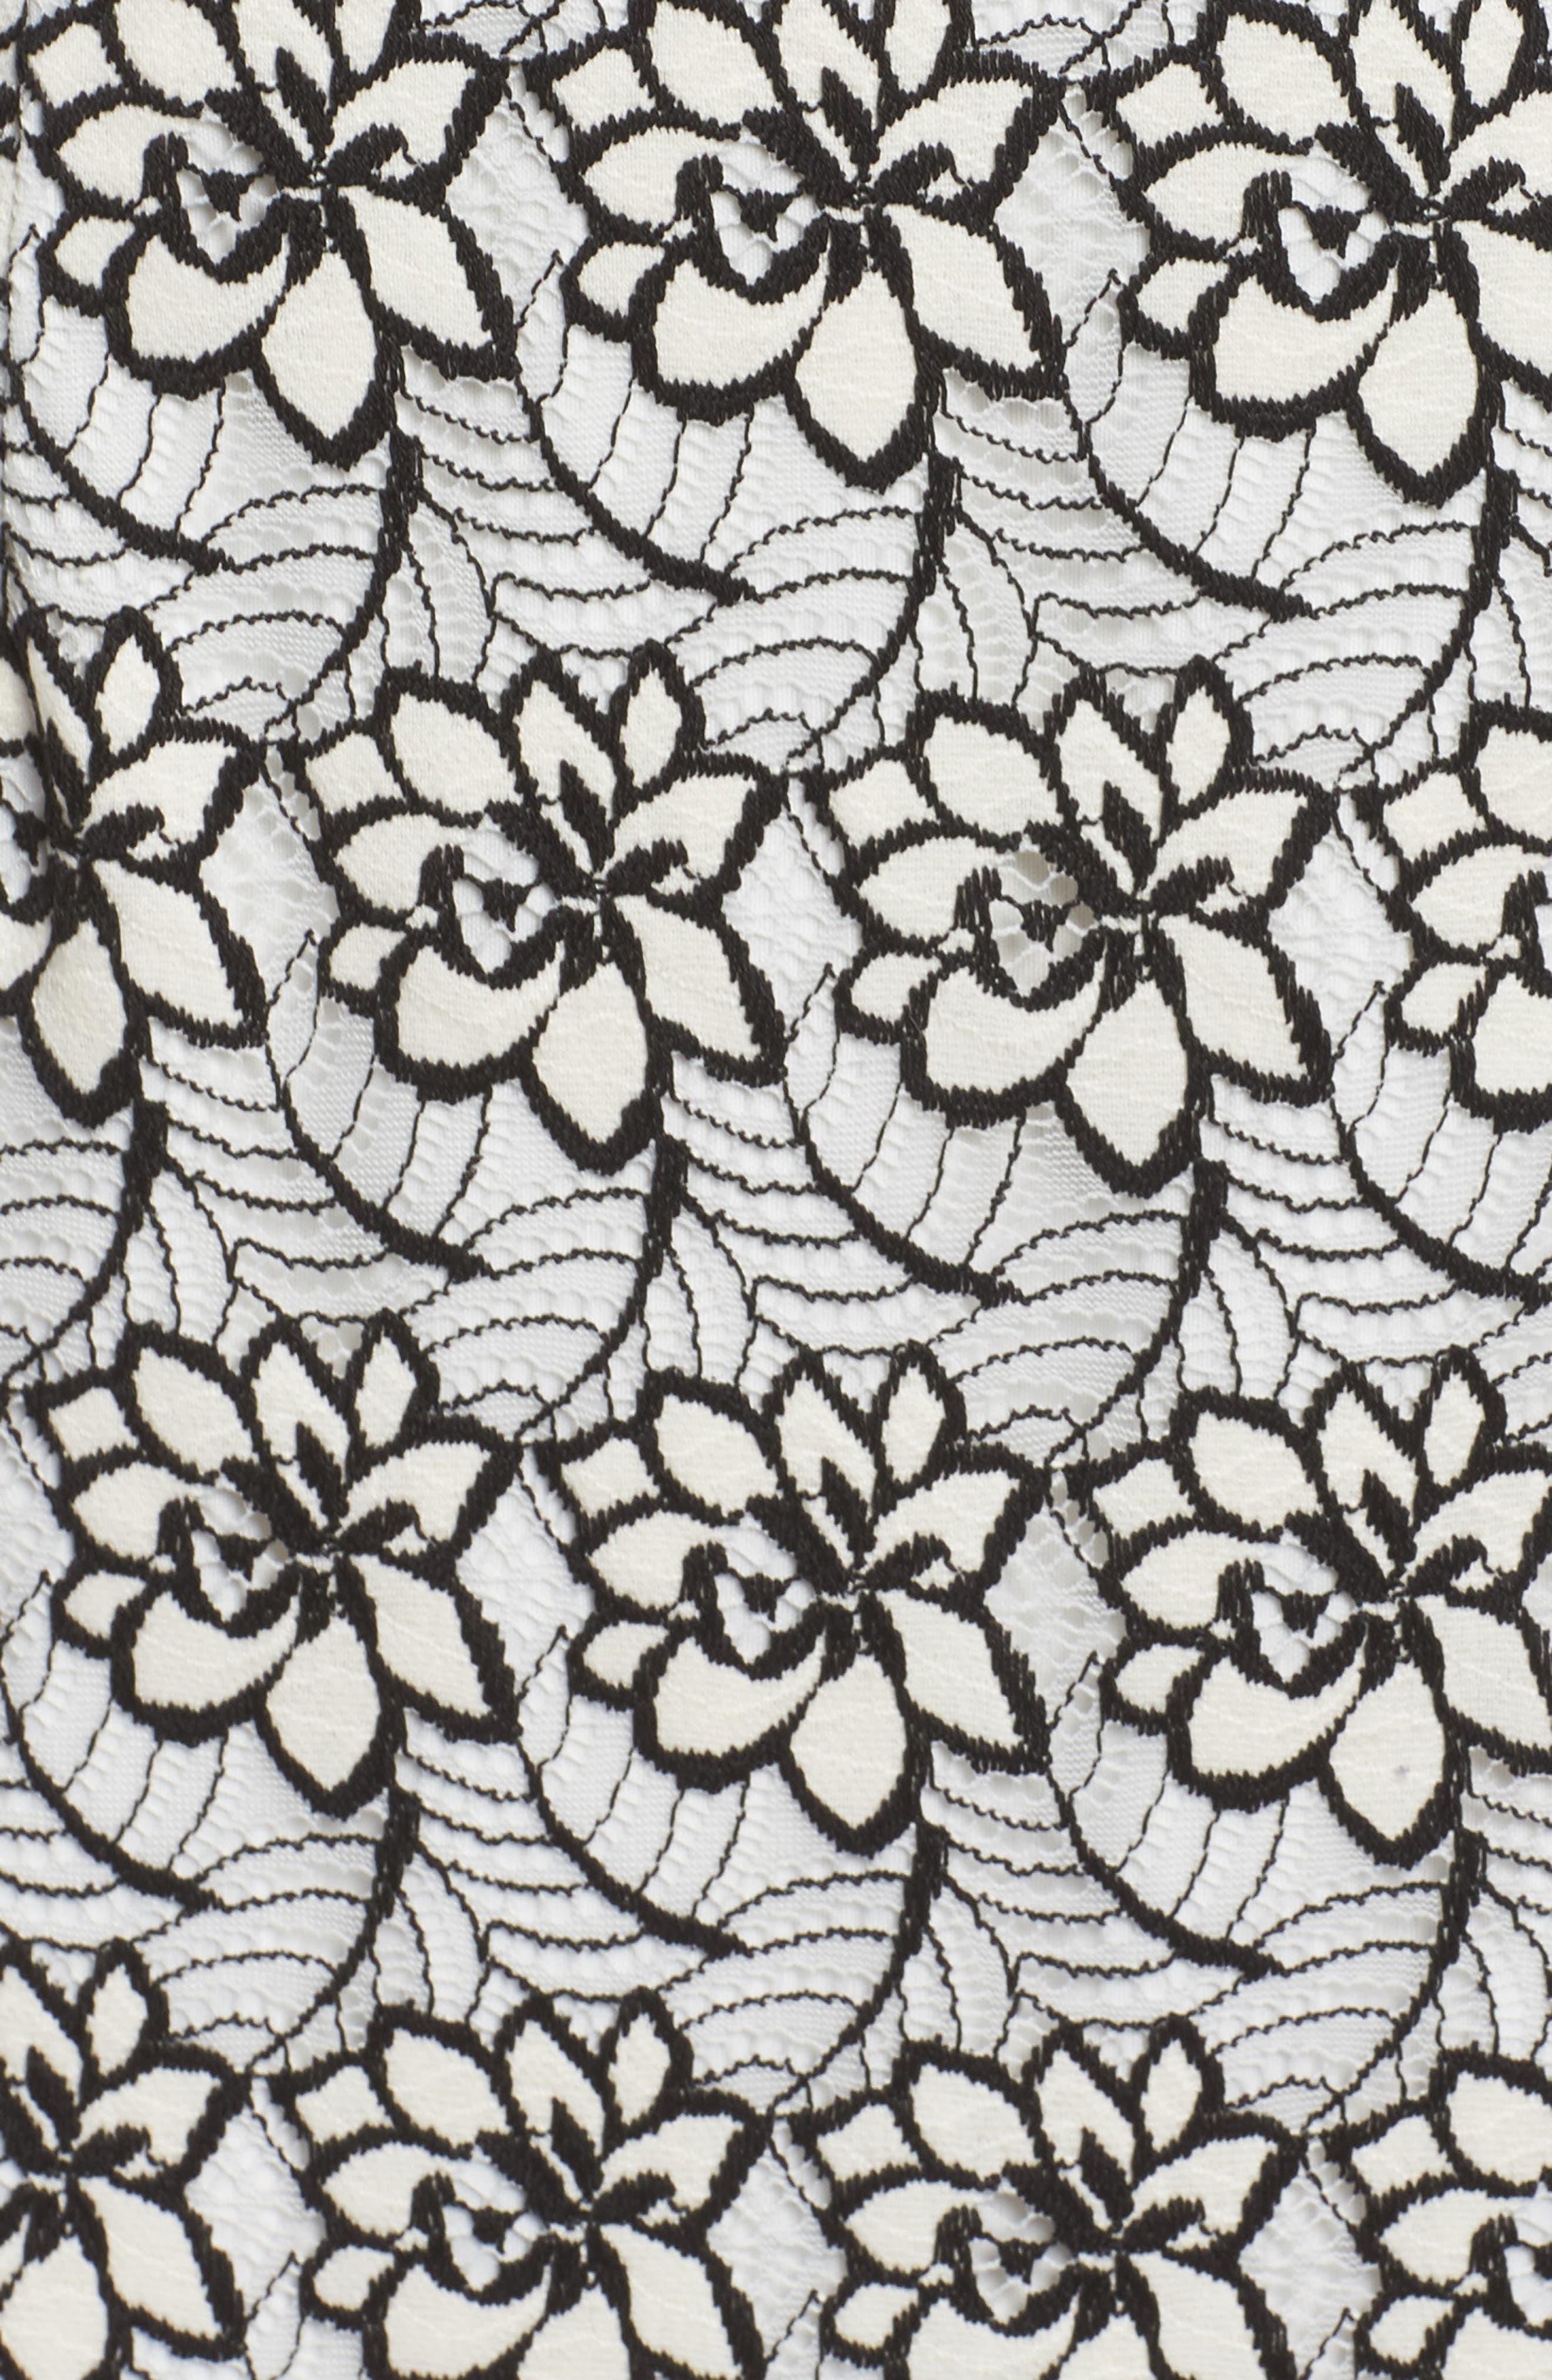 Lace Trim Sheath Dress,                             Alternate thumbnail 5, color,                             Ivory/ Black